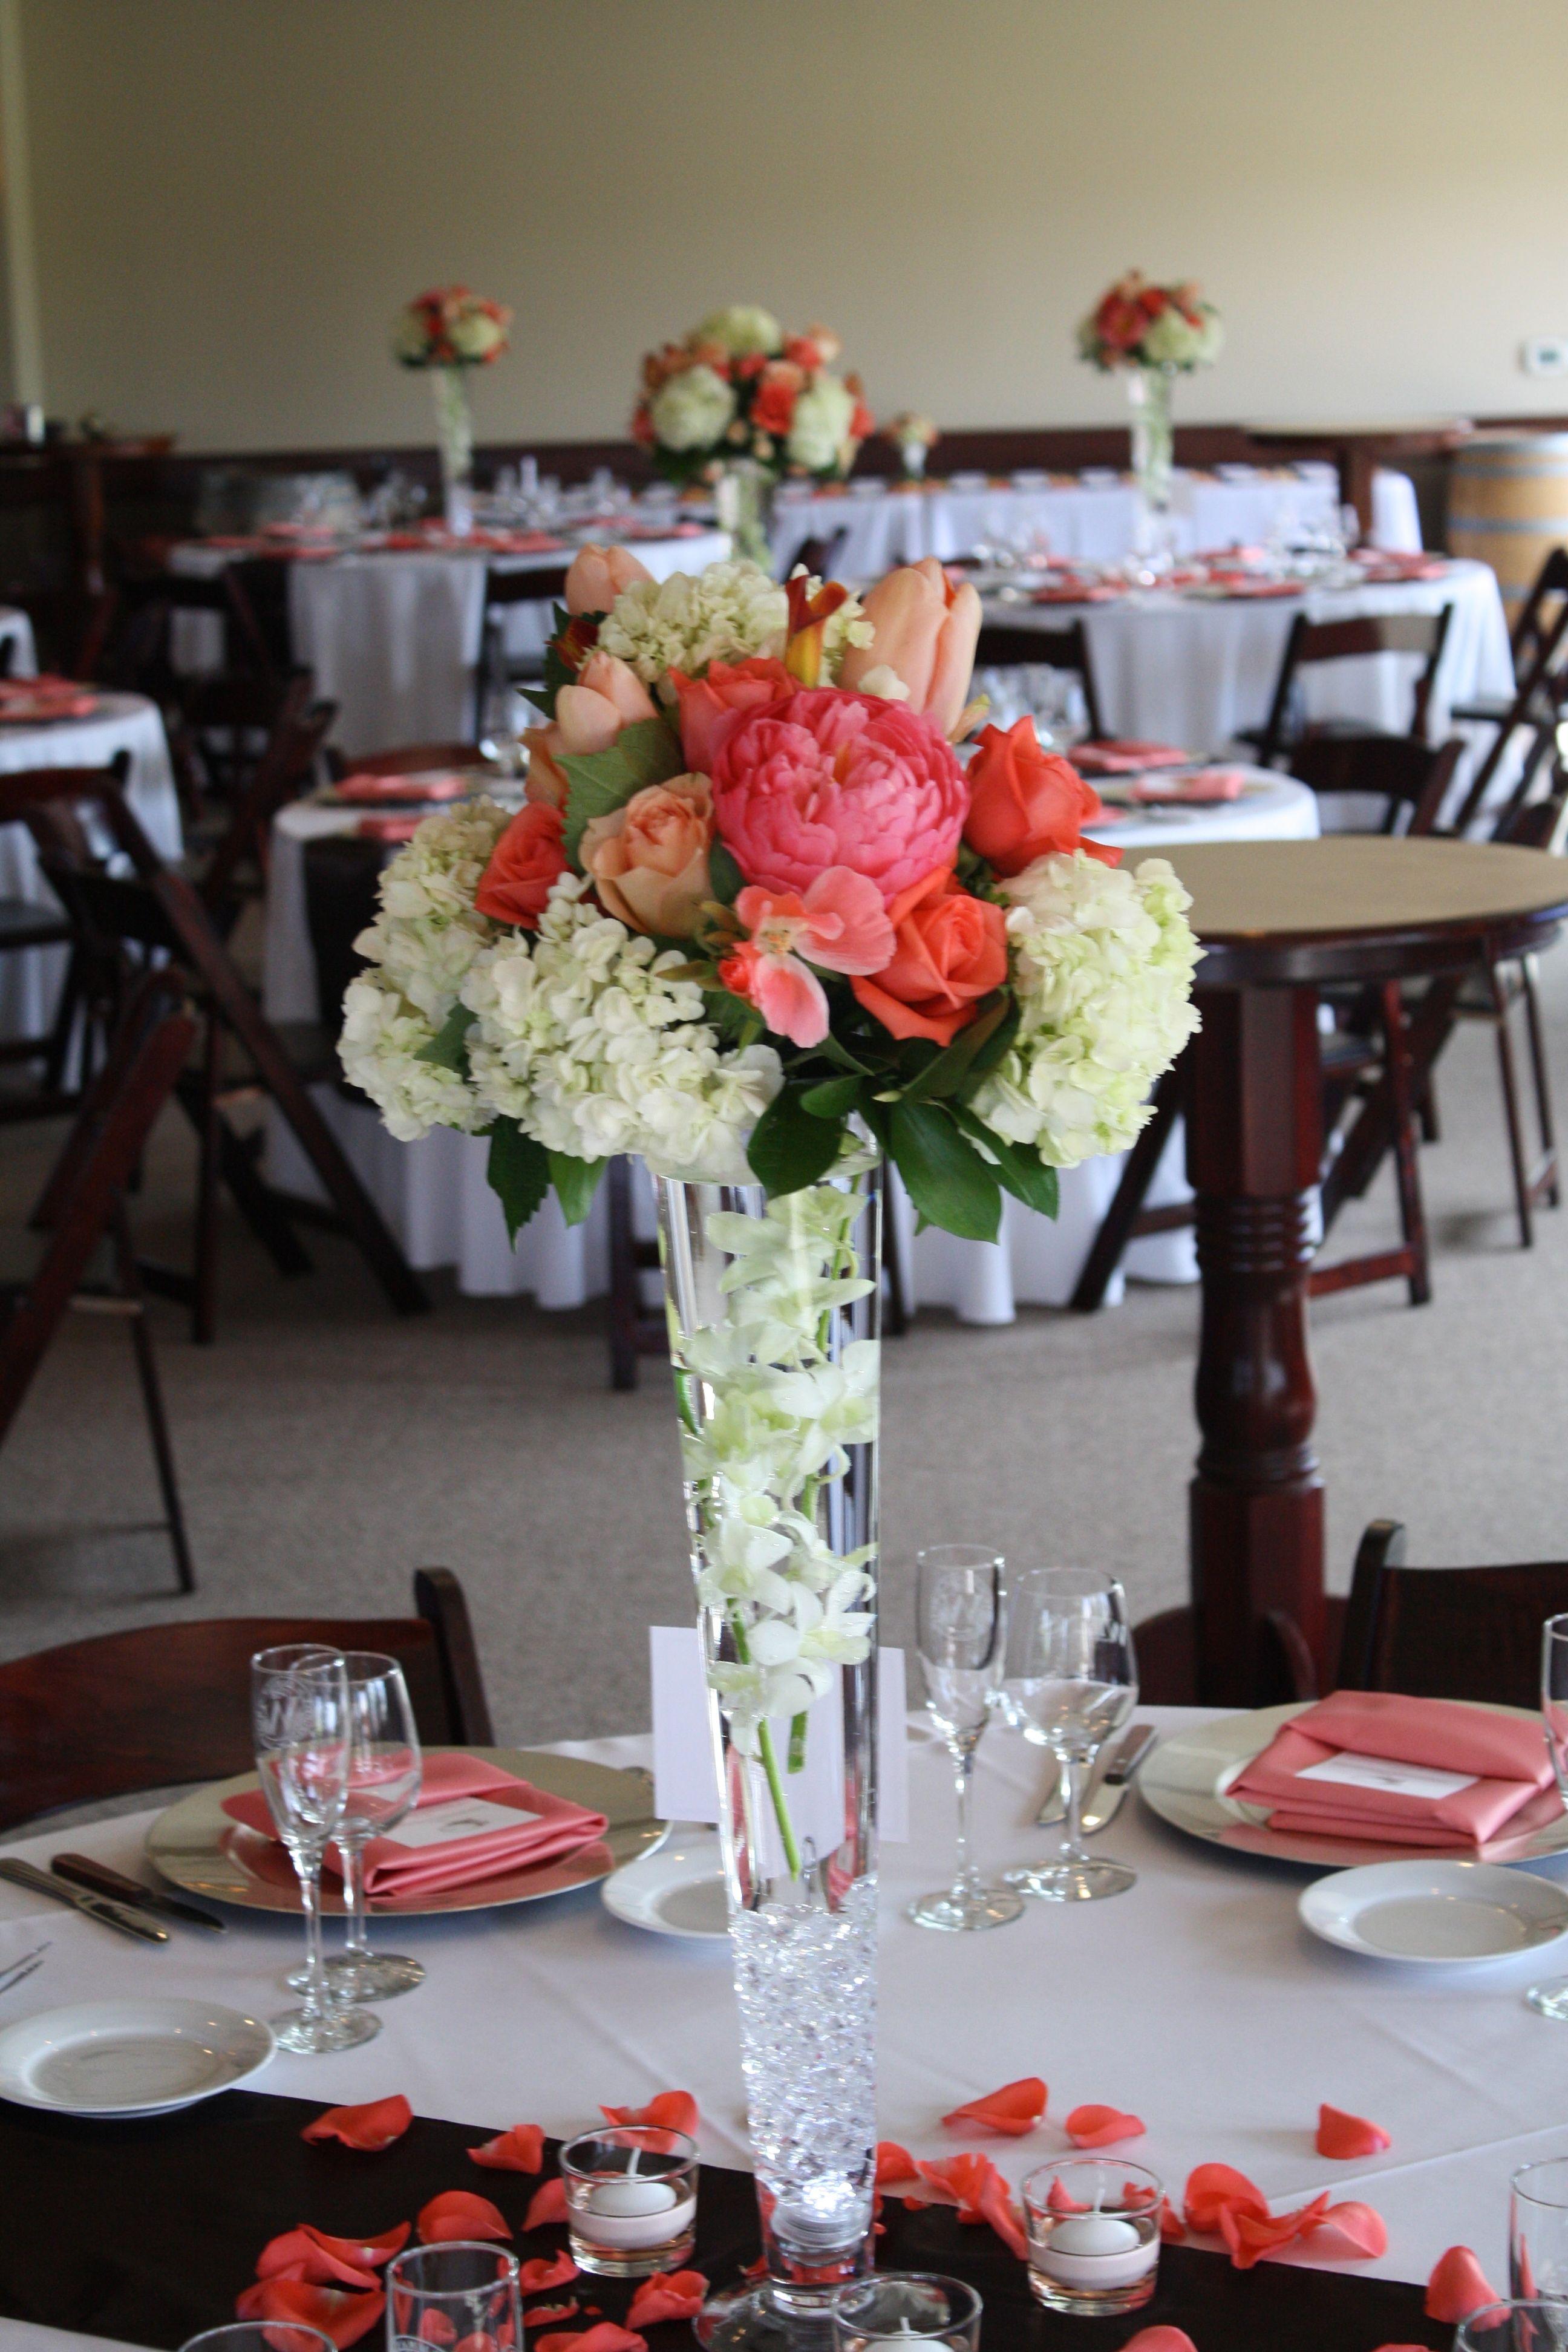 Centerpieces of white hydrangea coral peonys peach